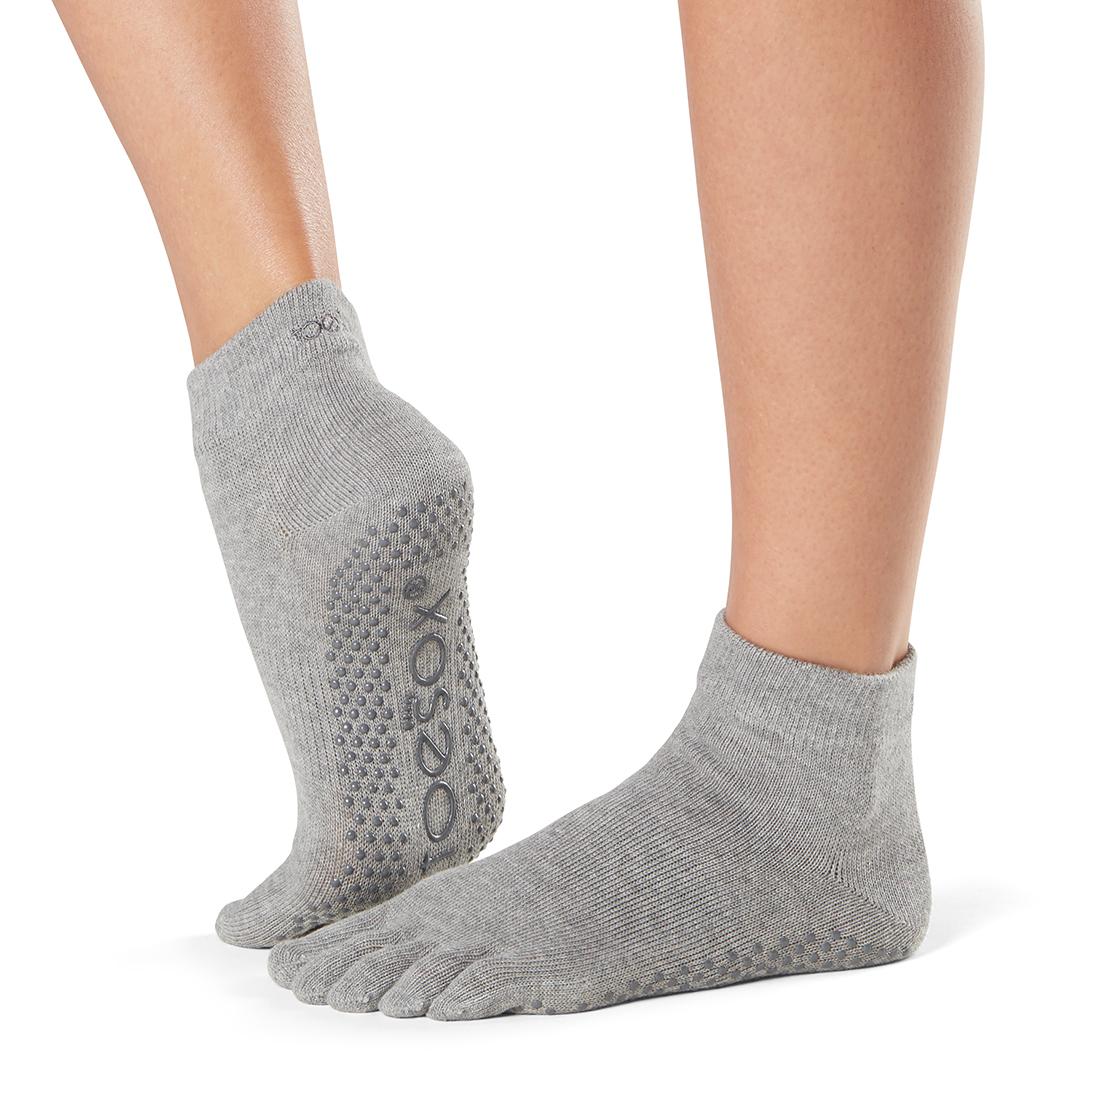 Yogasocken ToeSox Ankle Full Toe Heather Grey